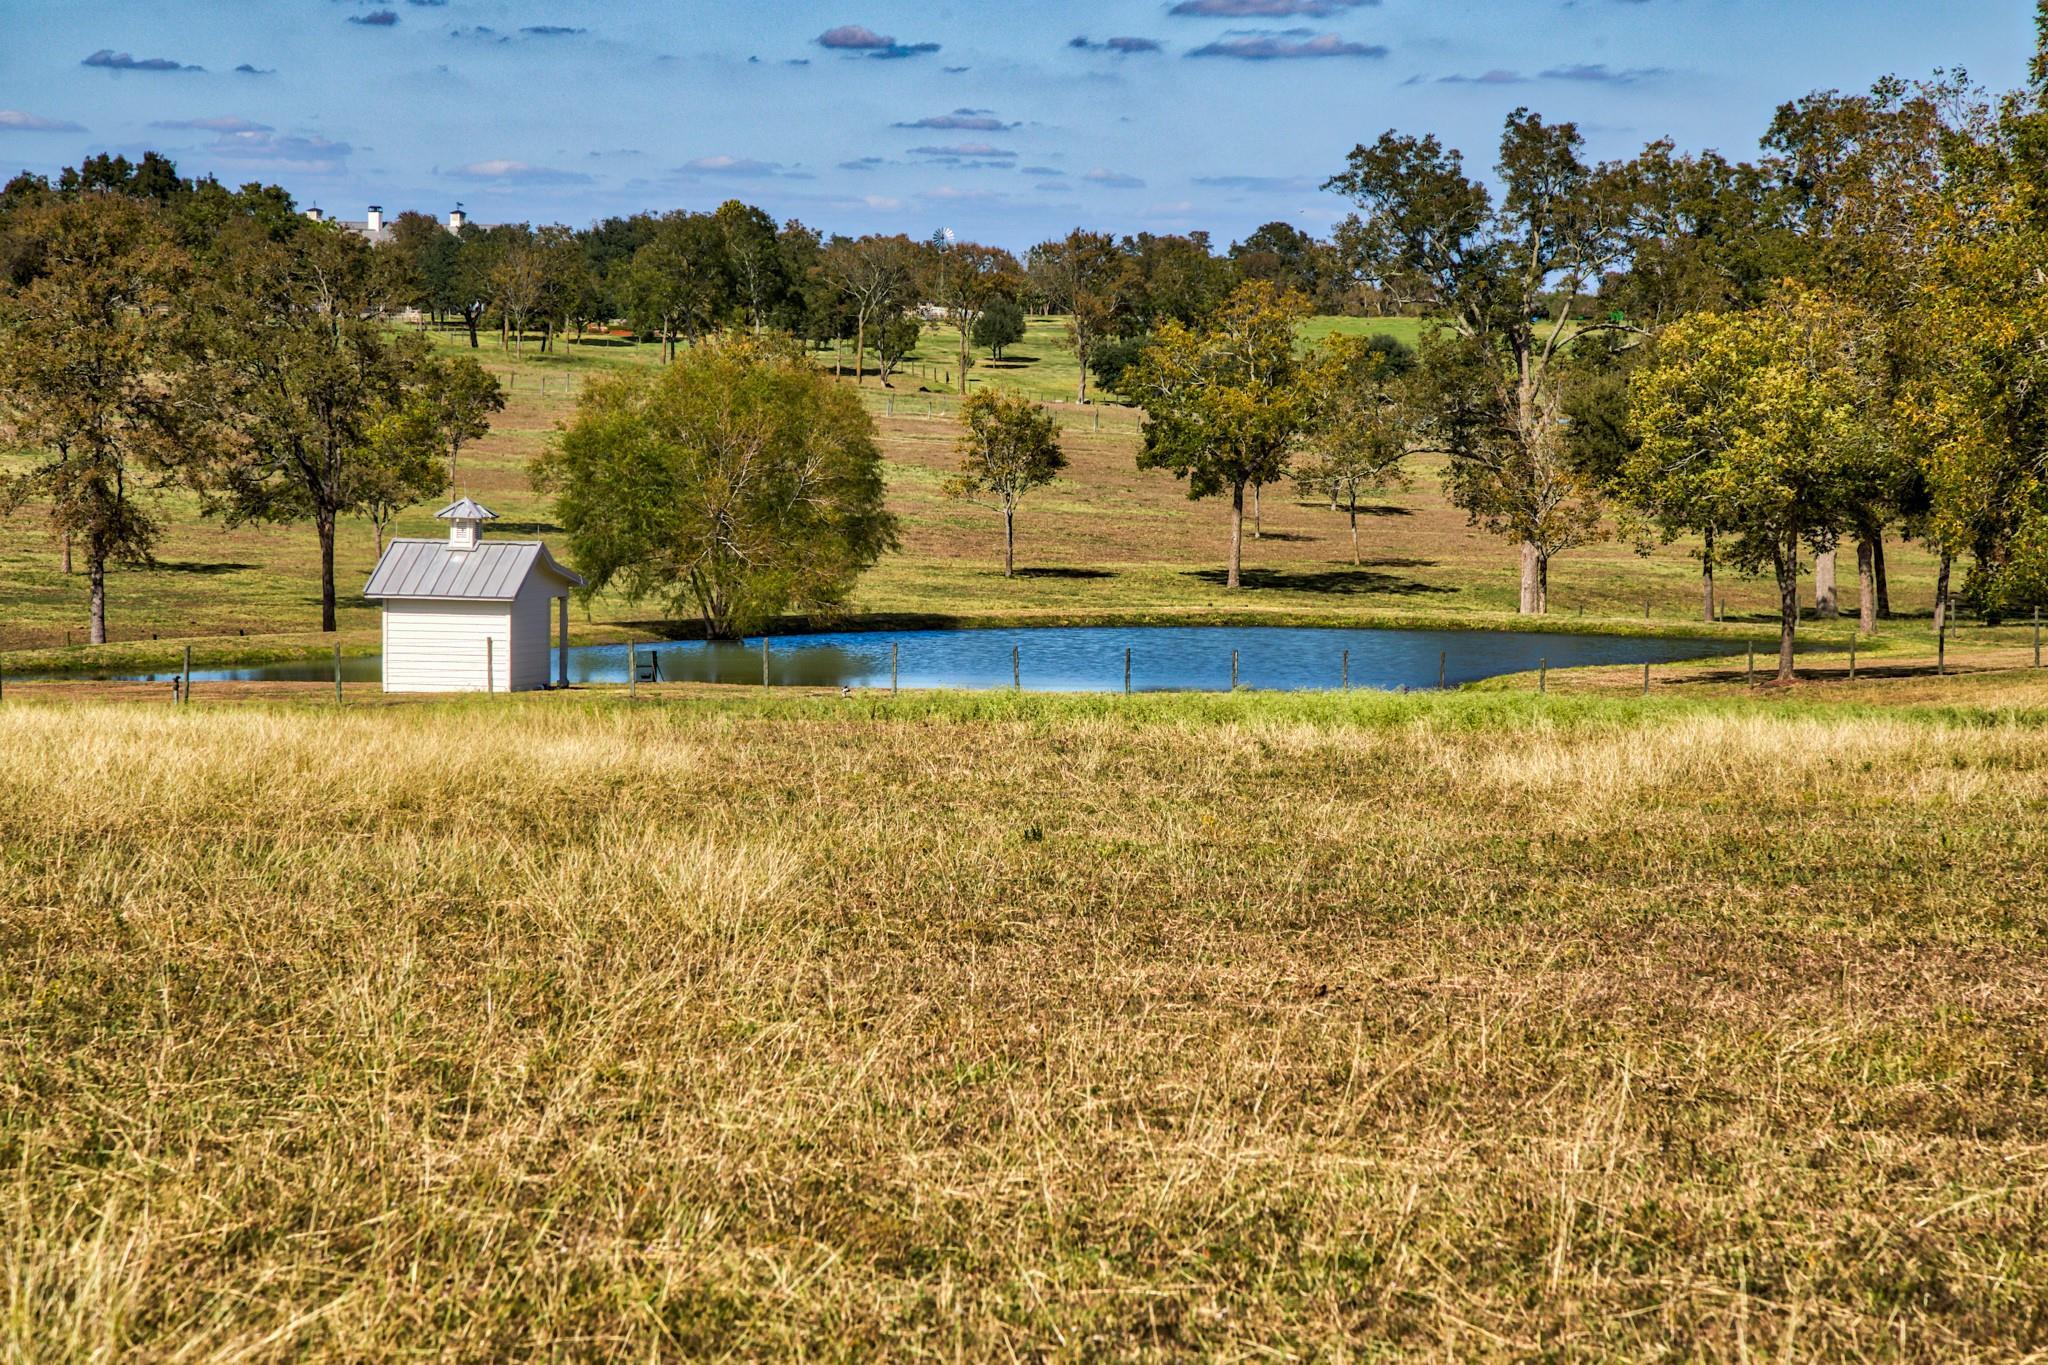 00 Tract B Farm To Market 2447 E Property Photo